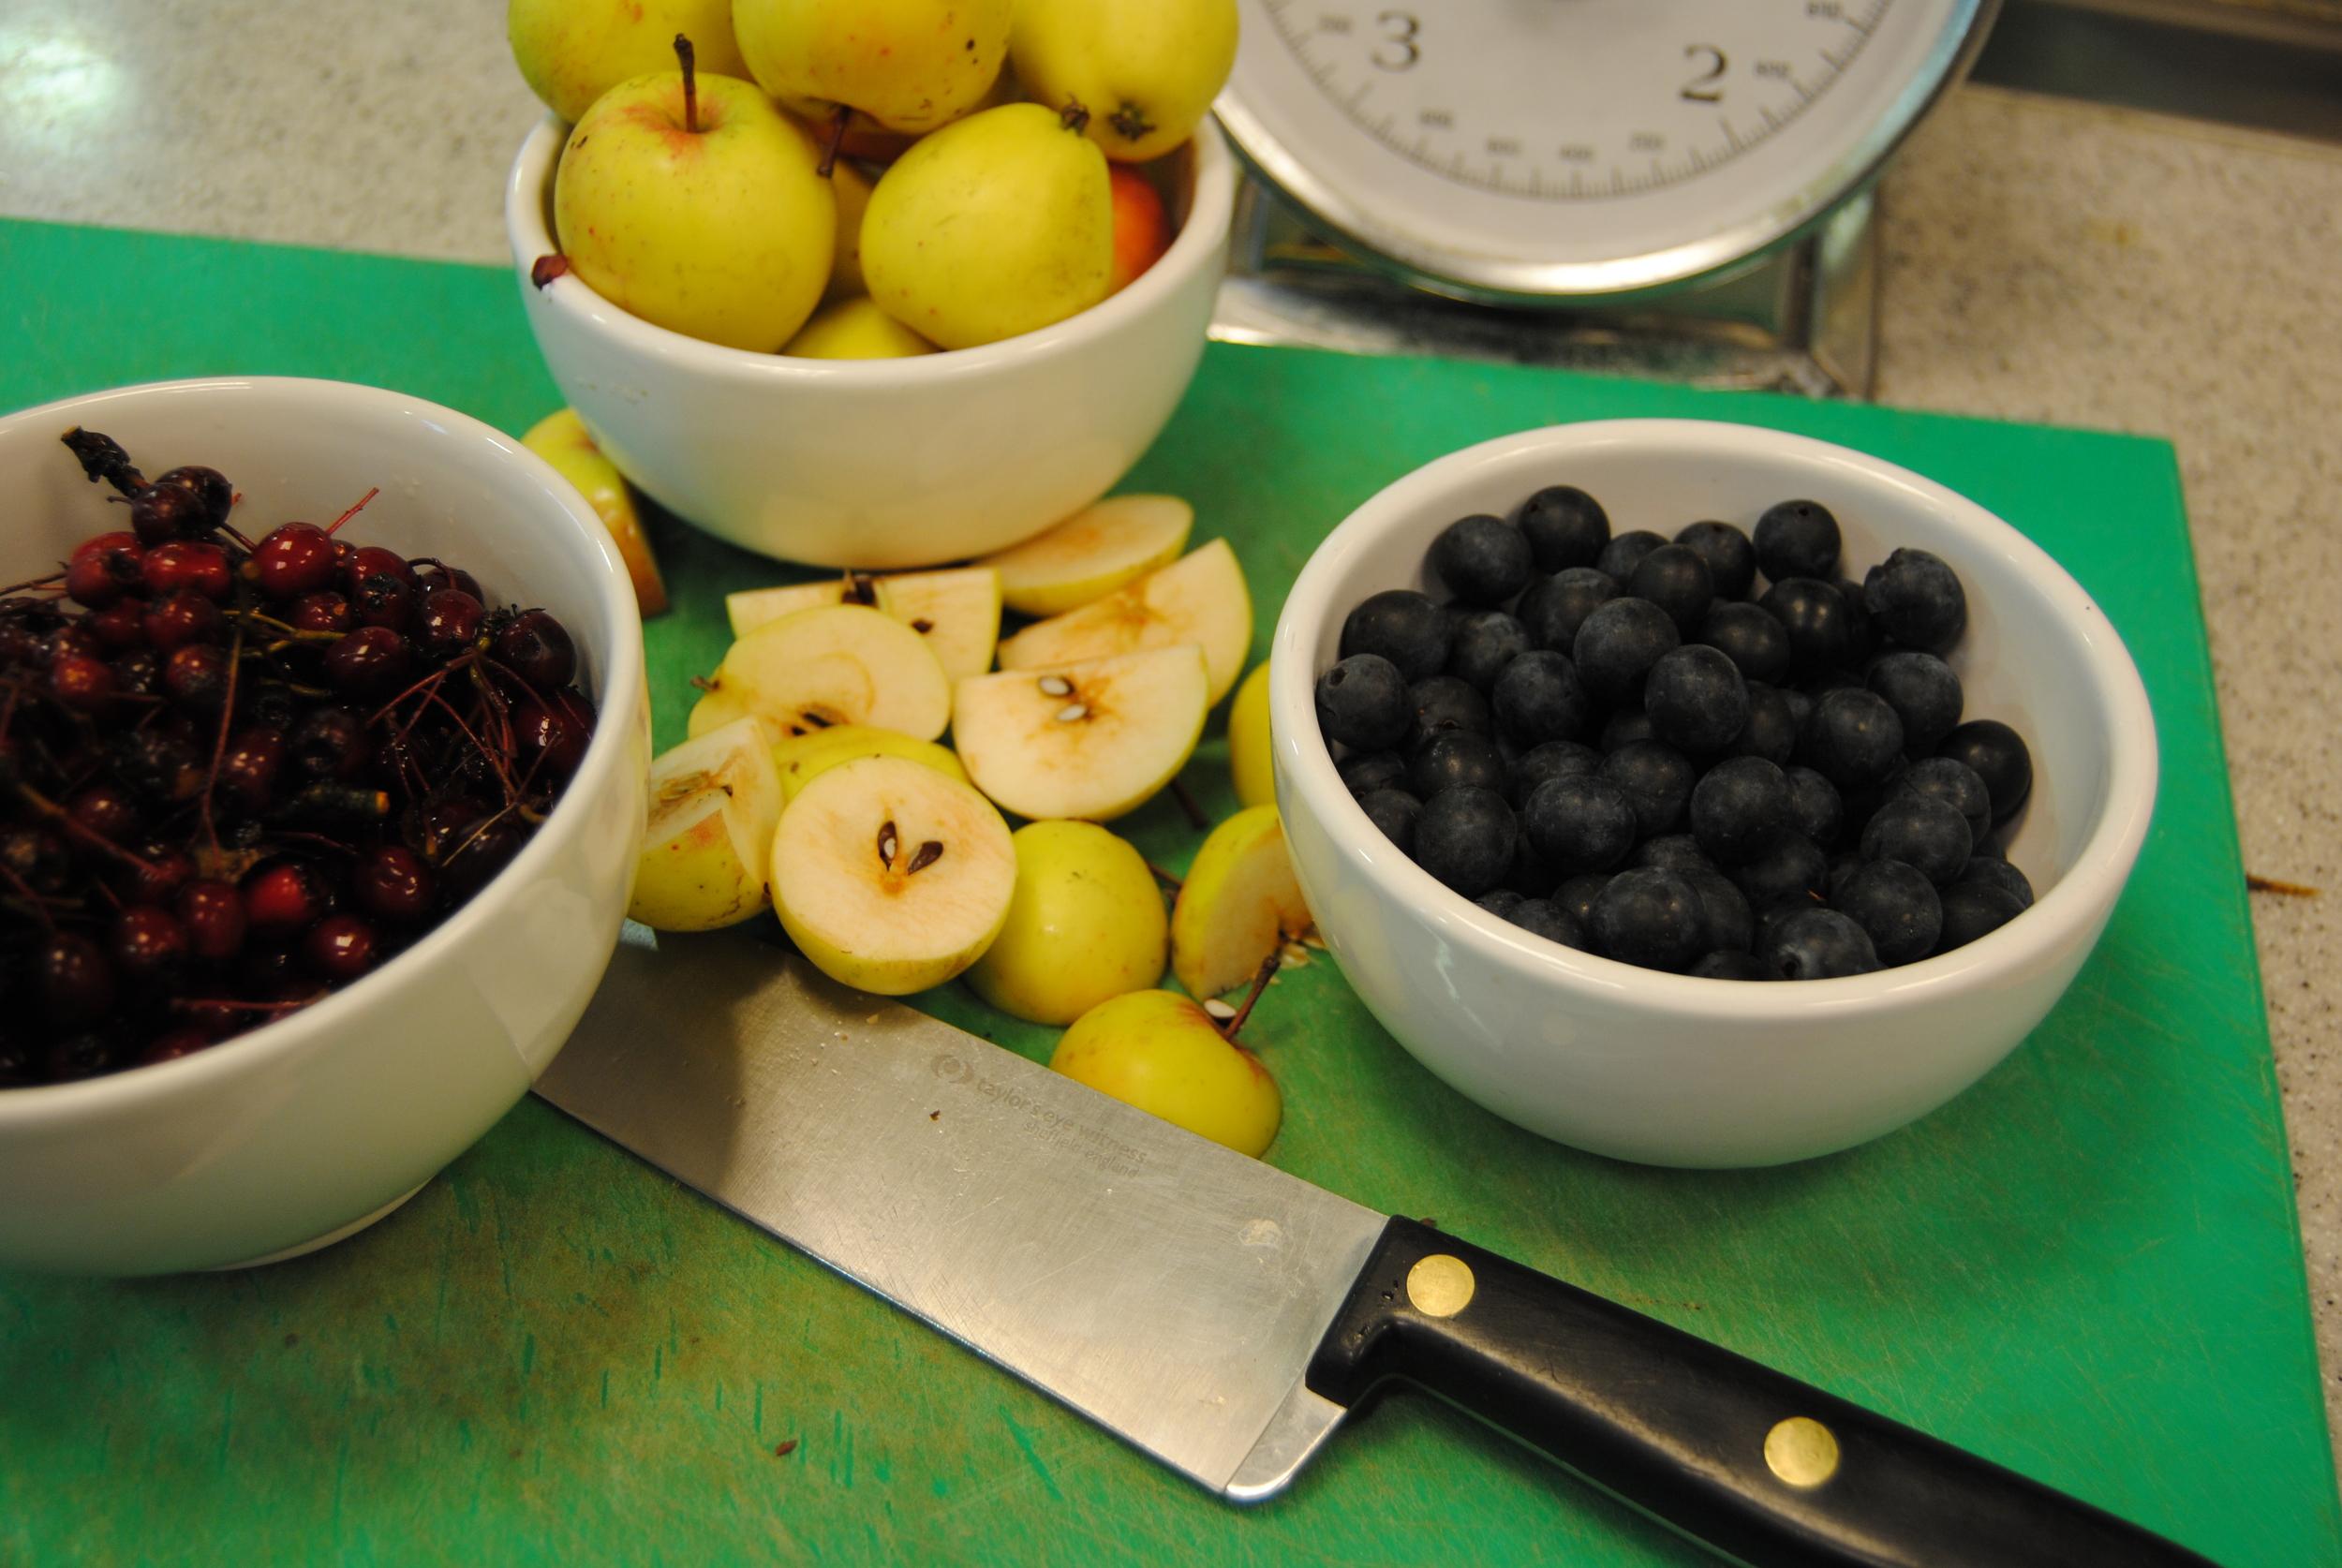 hedgrerowjellyingredients.jpg